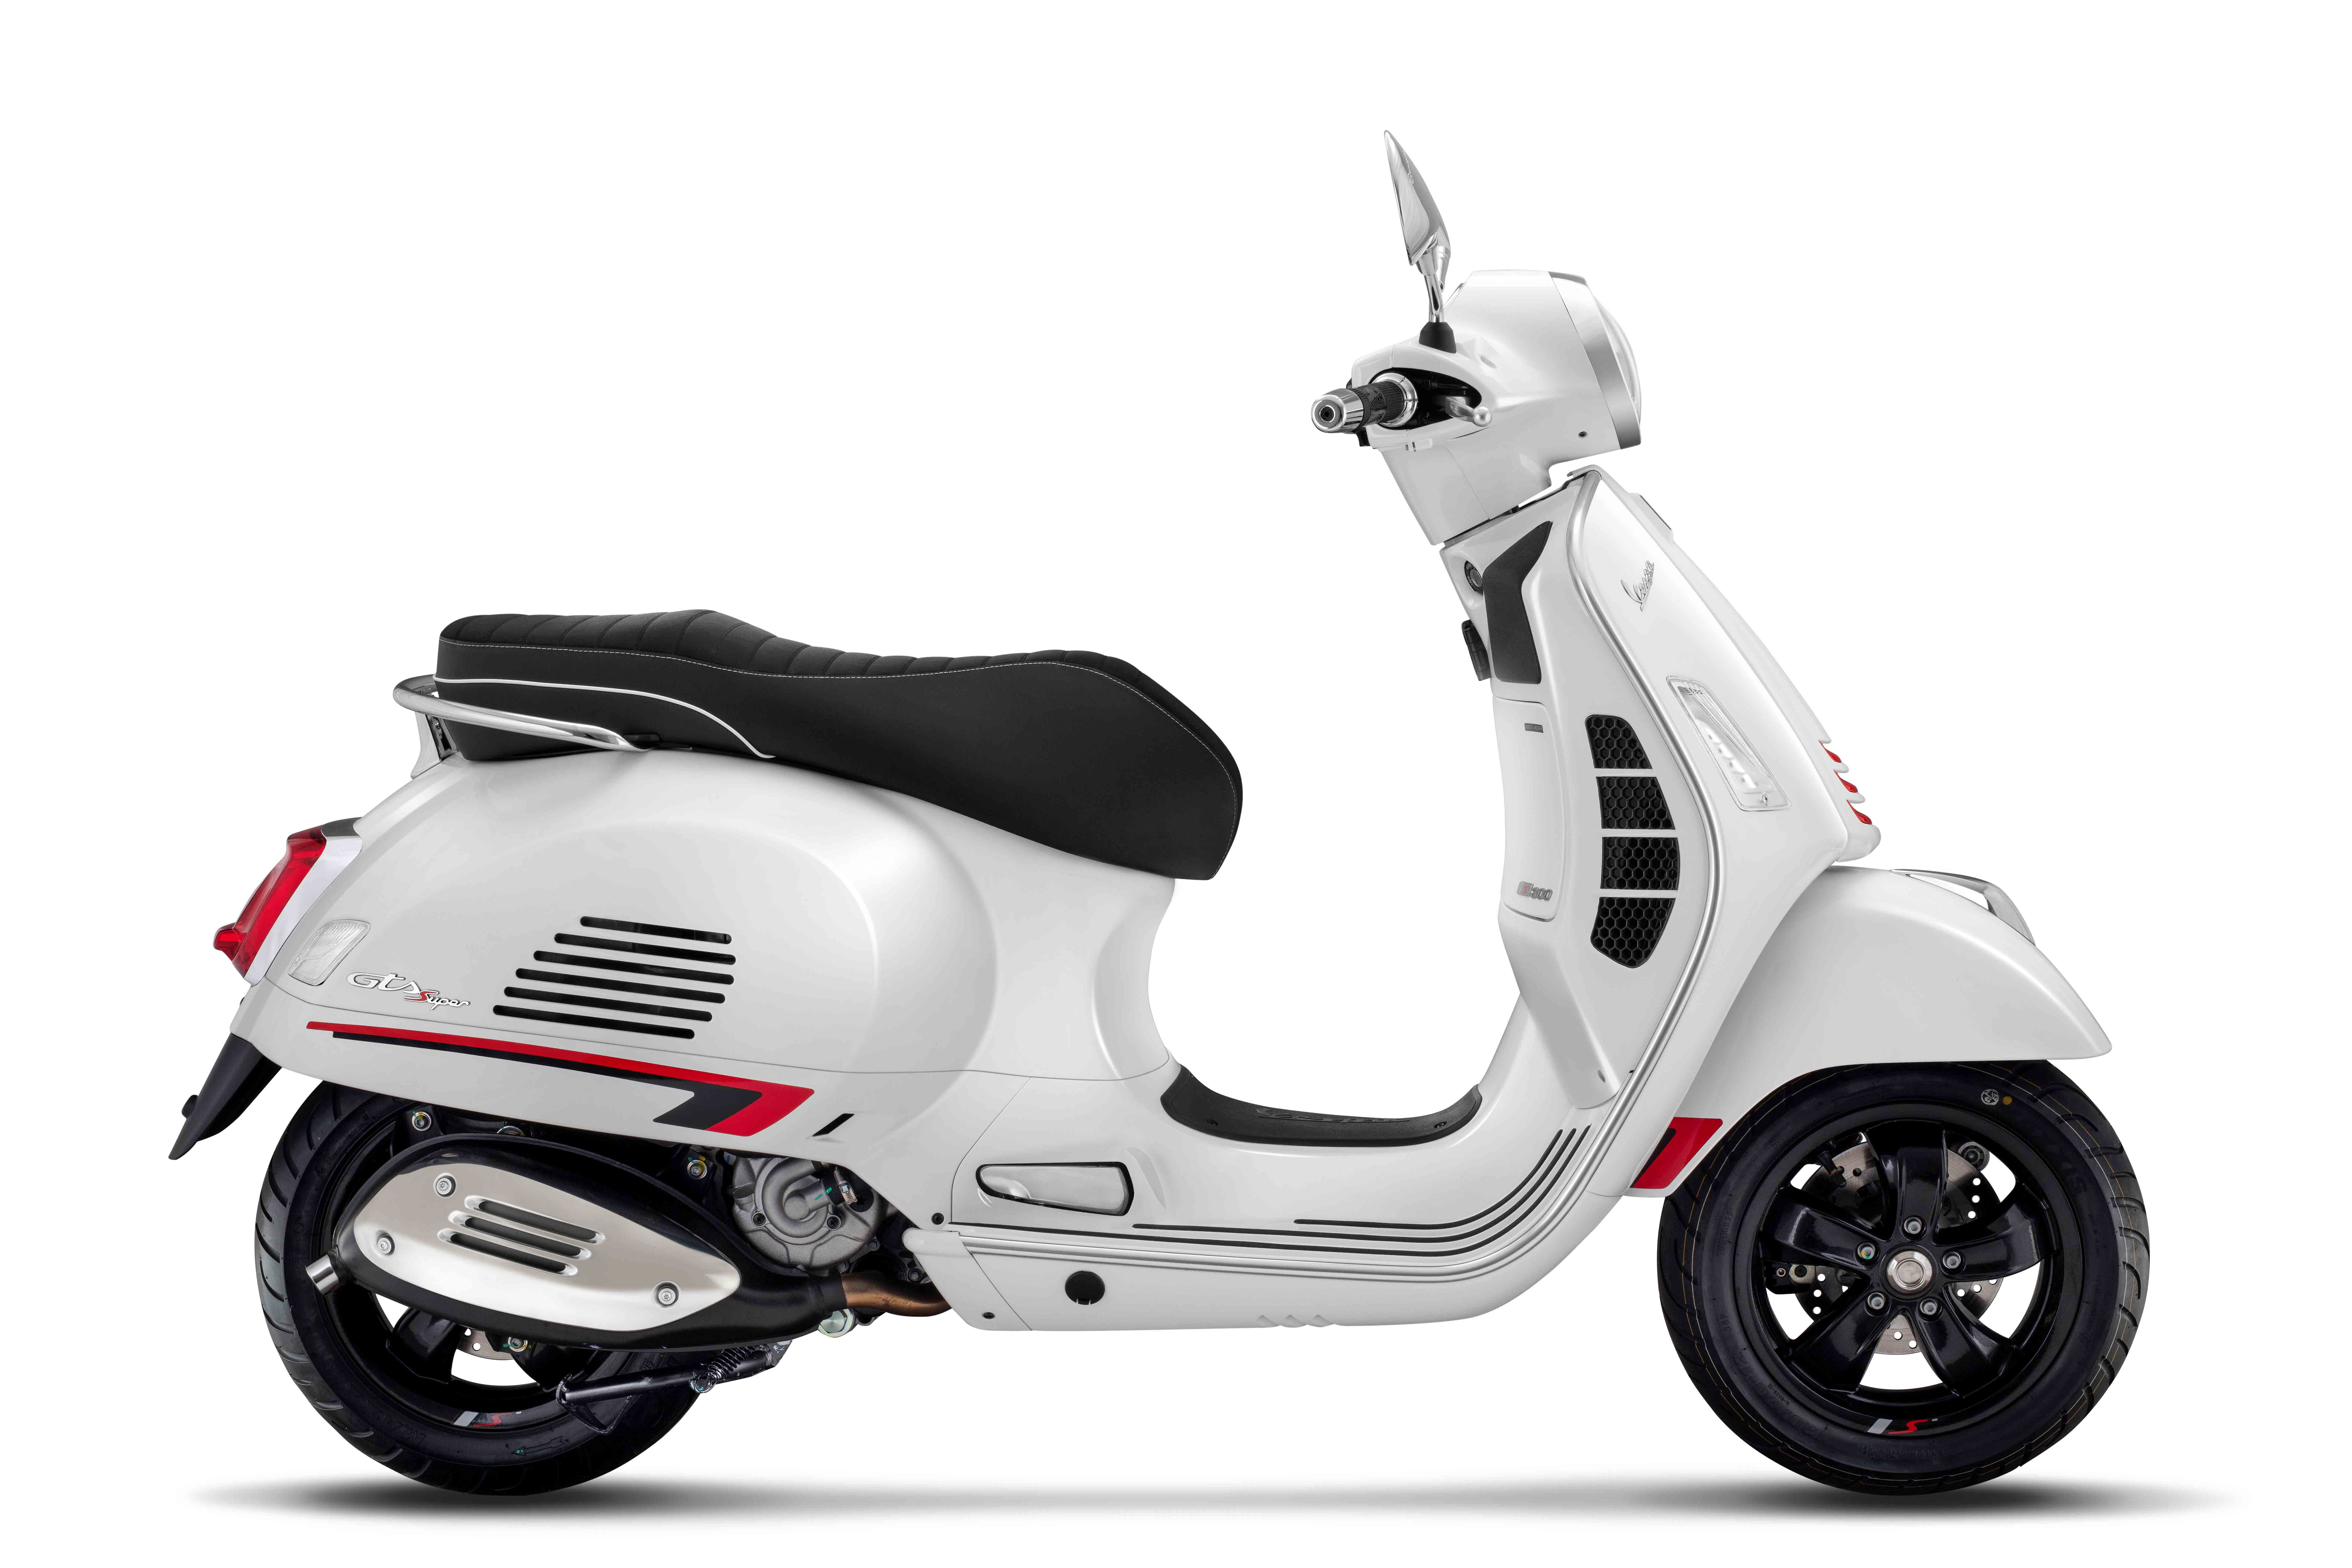 gts-super-sport-glossy-white-ss-01.jpg